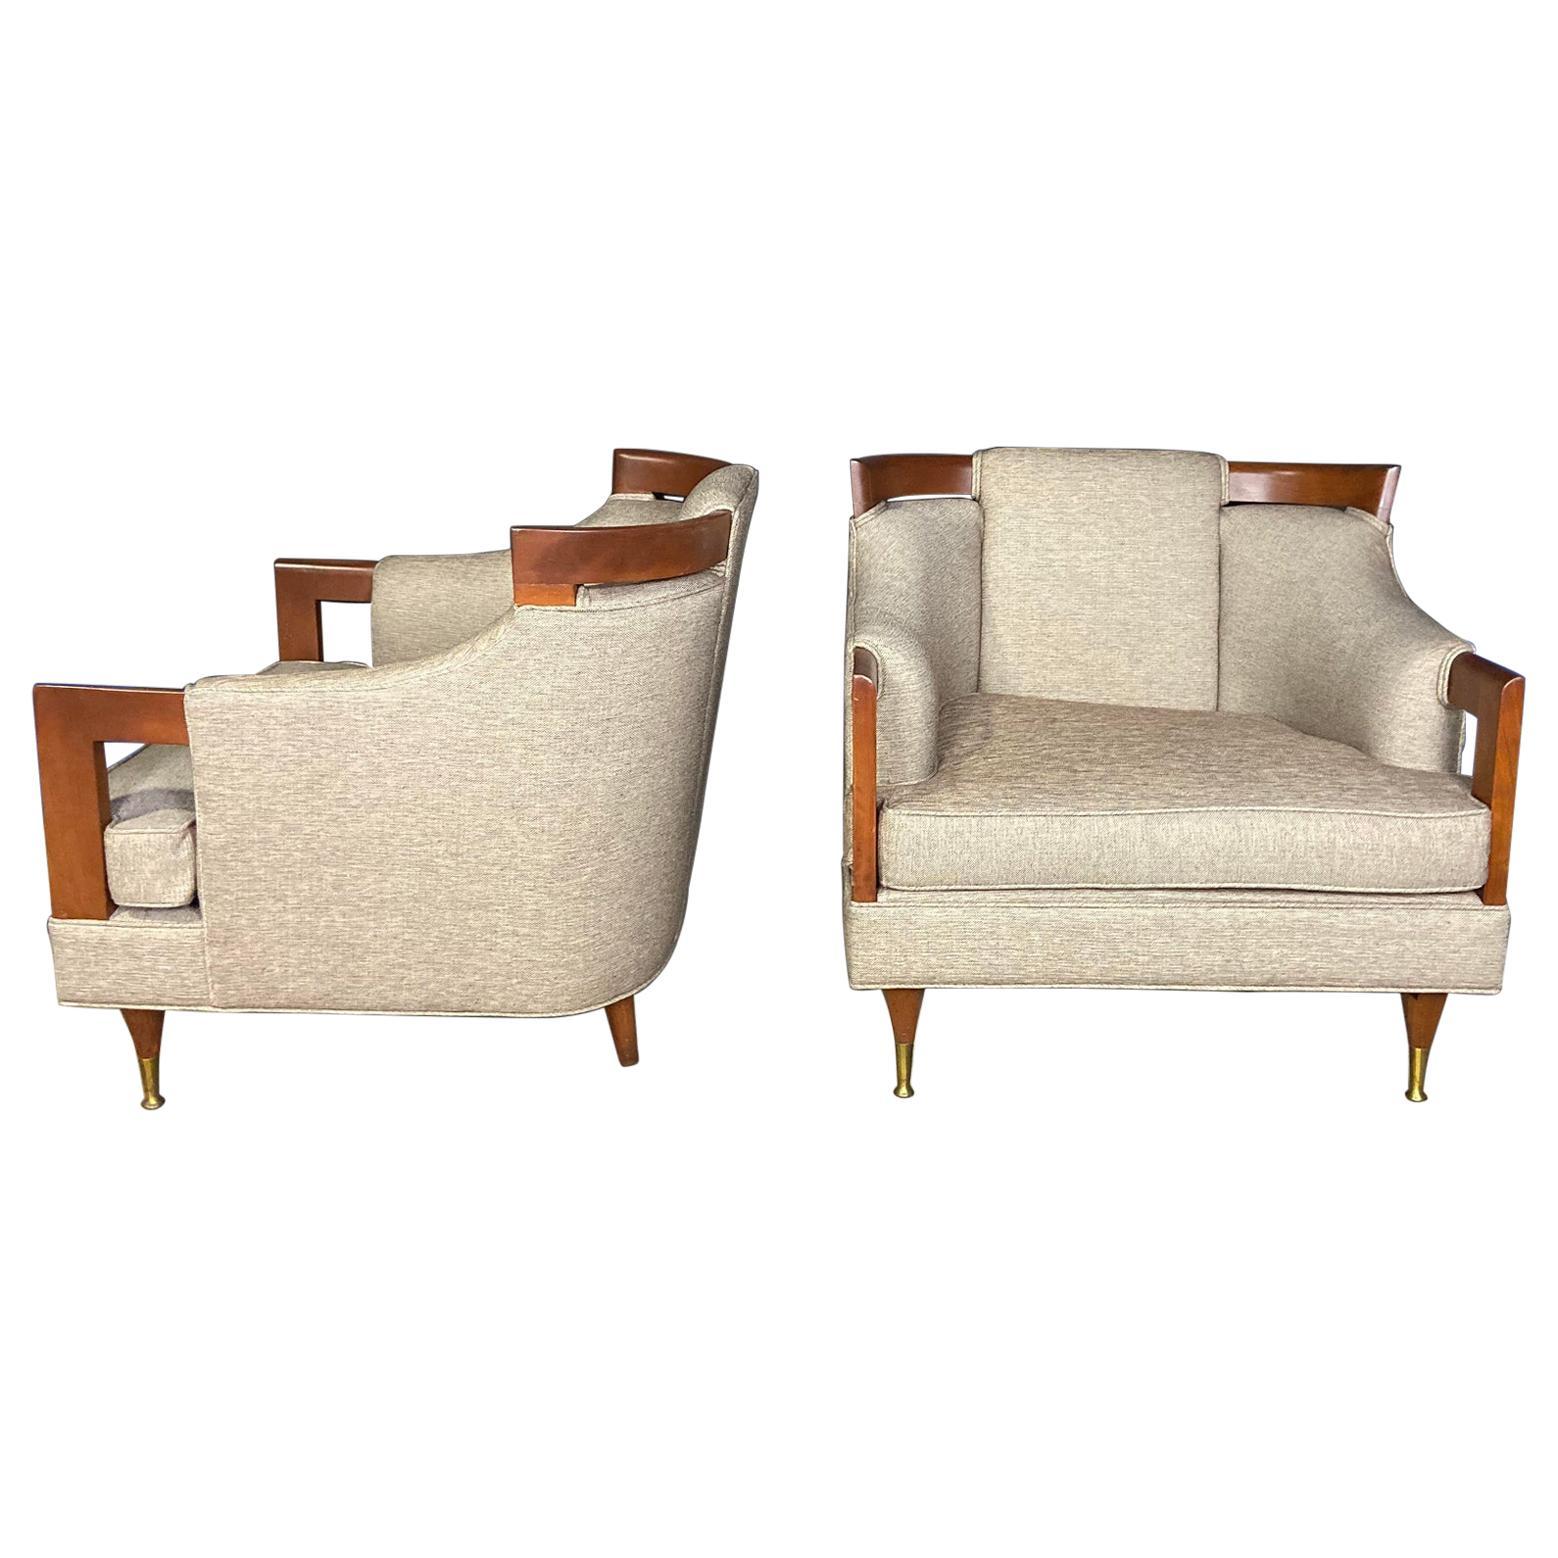 Mid-Century Modern Club Chair Pairing